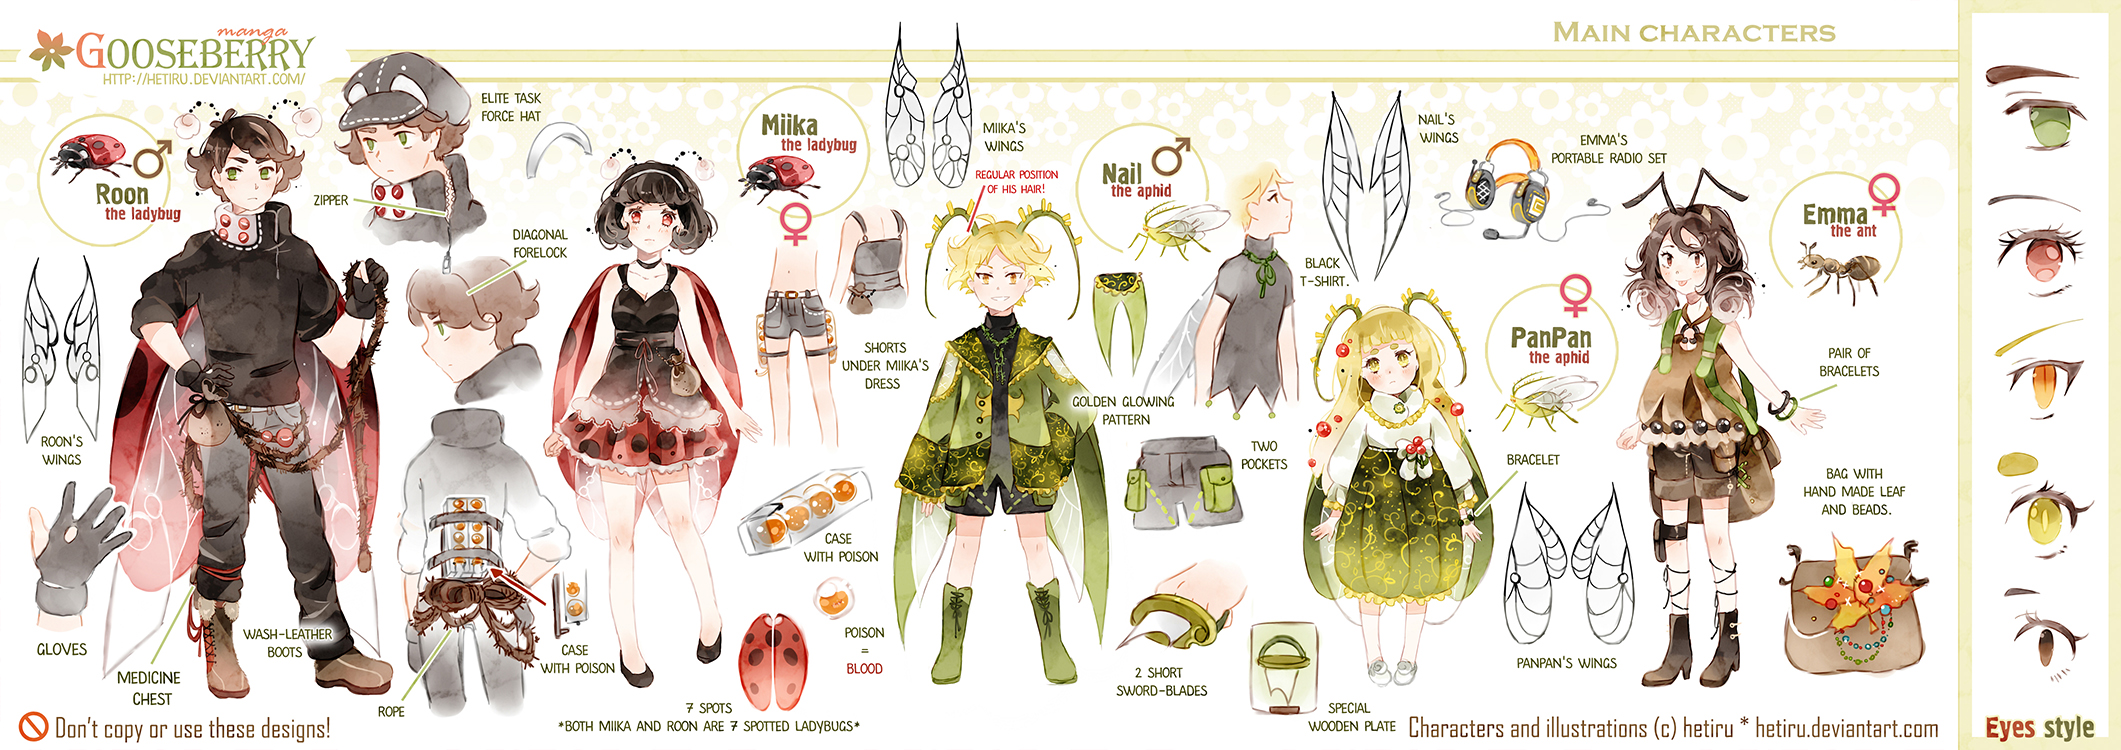 .GOOSEBERRY's characters ref. by Hetiru